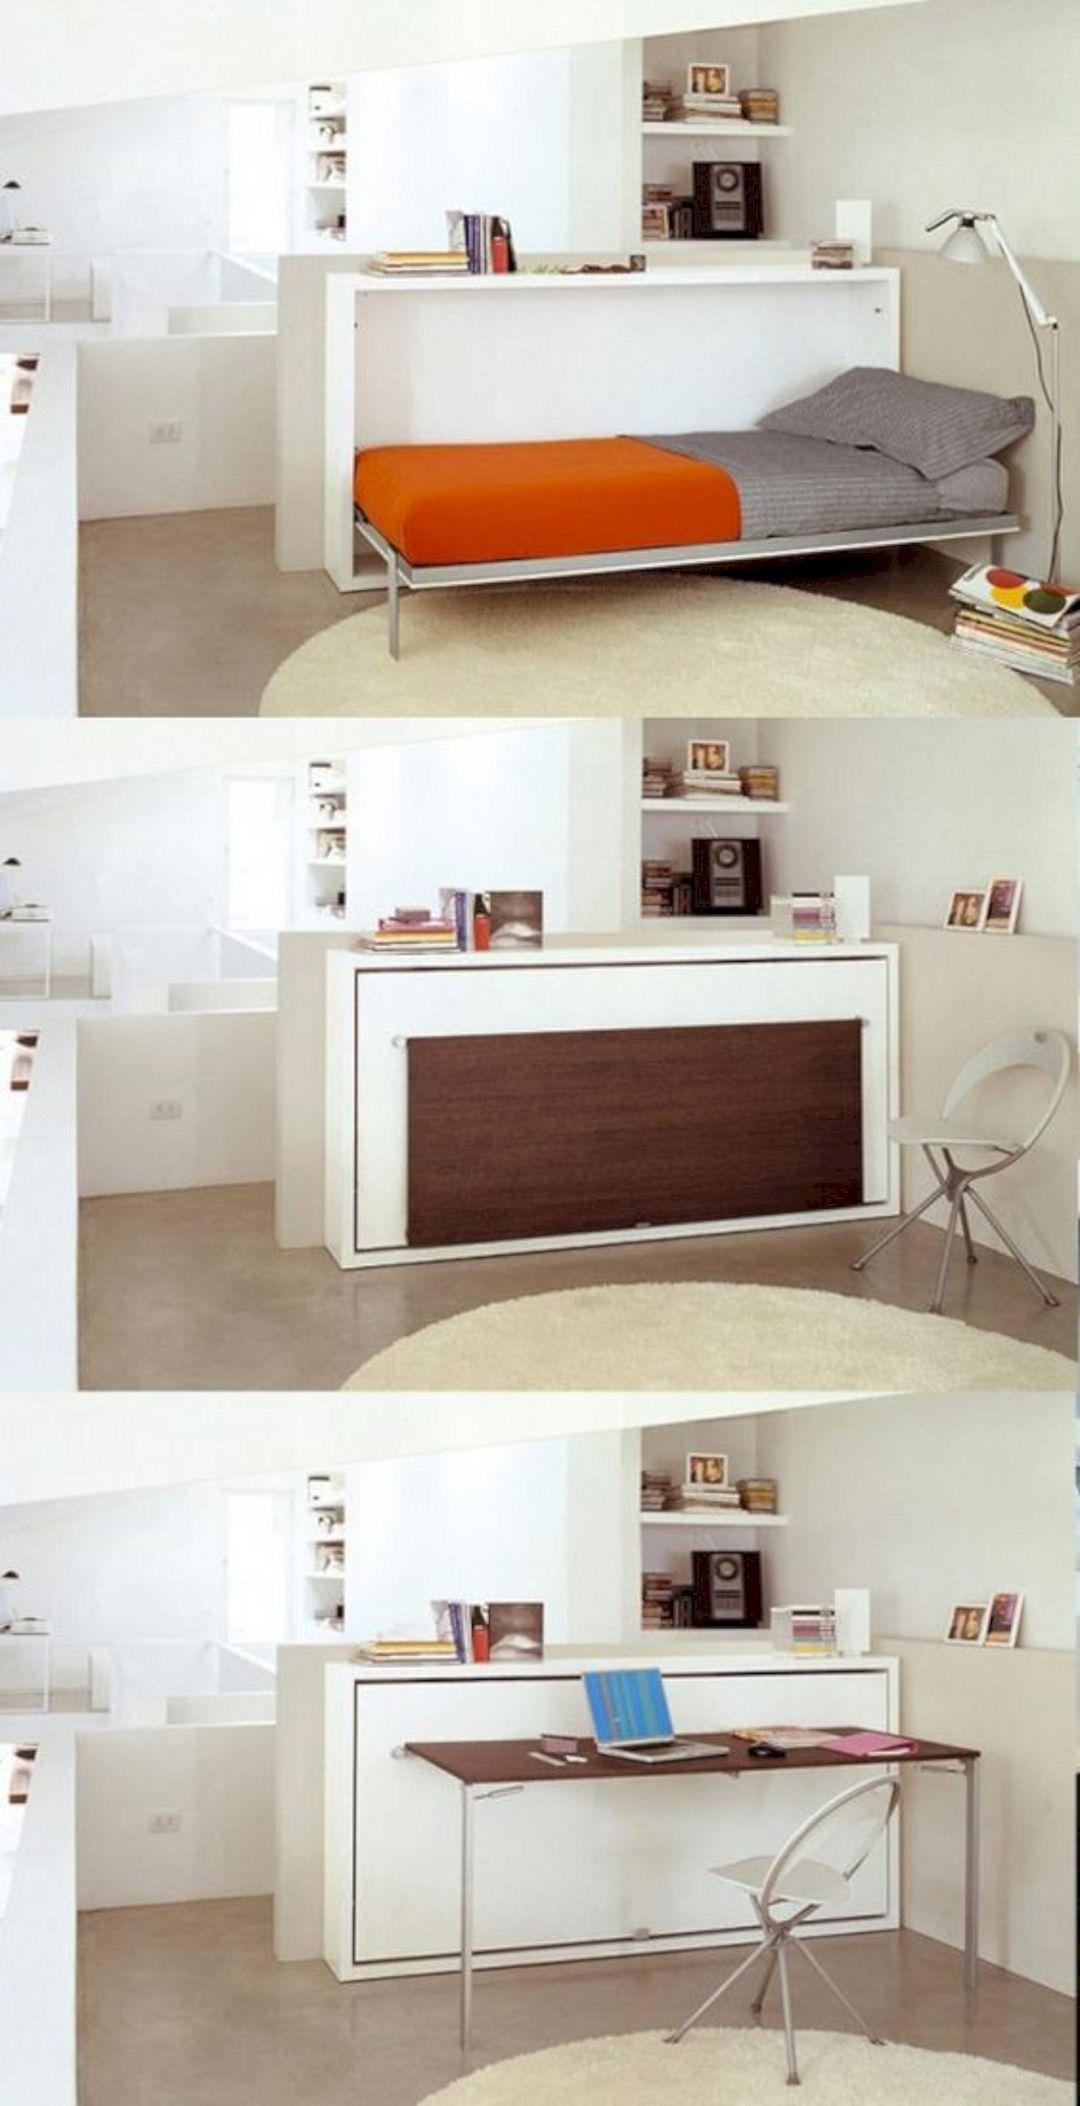 Tiny House Furniture Ideas 14 Tiny House Pinterest # Muebles Multifuncionales Para Espacios Pequenos